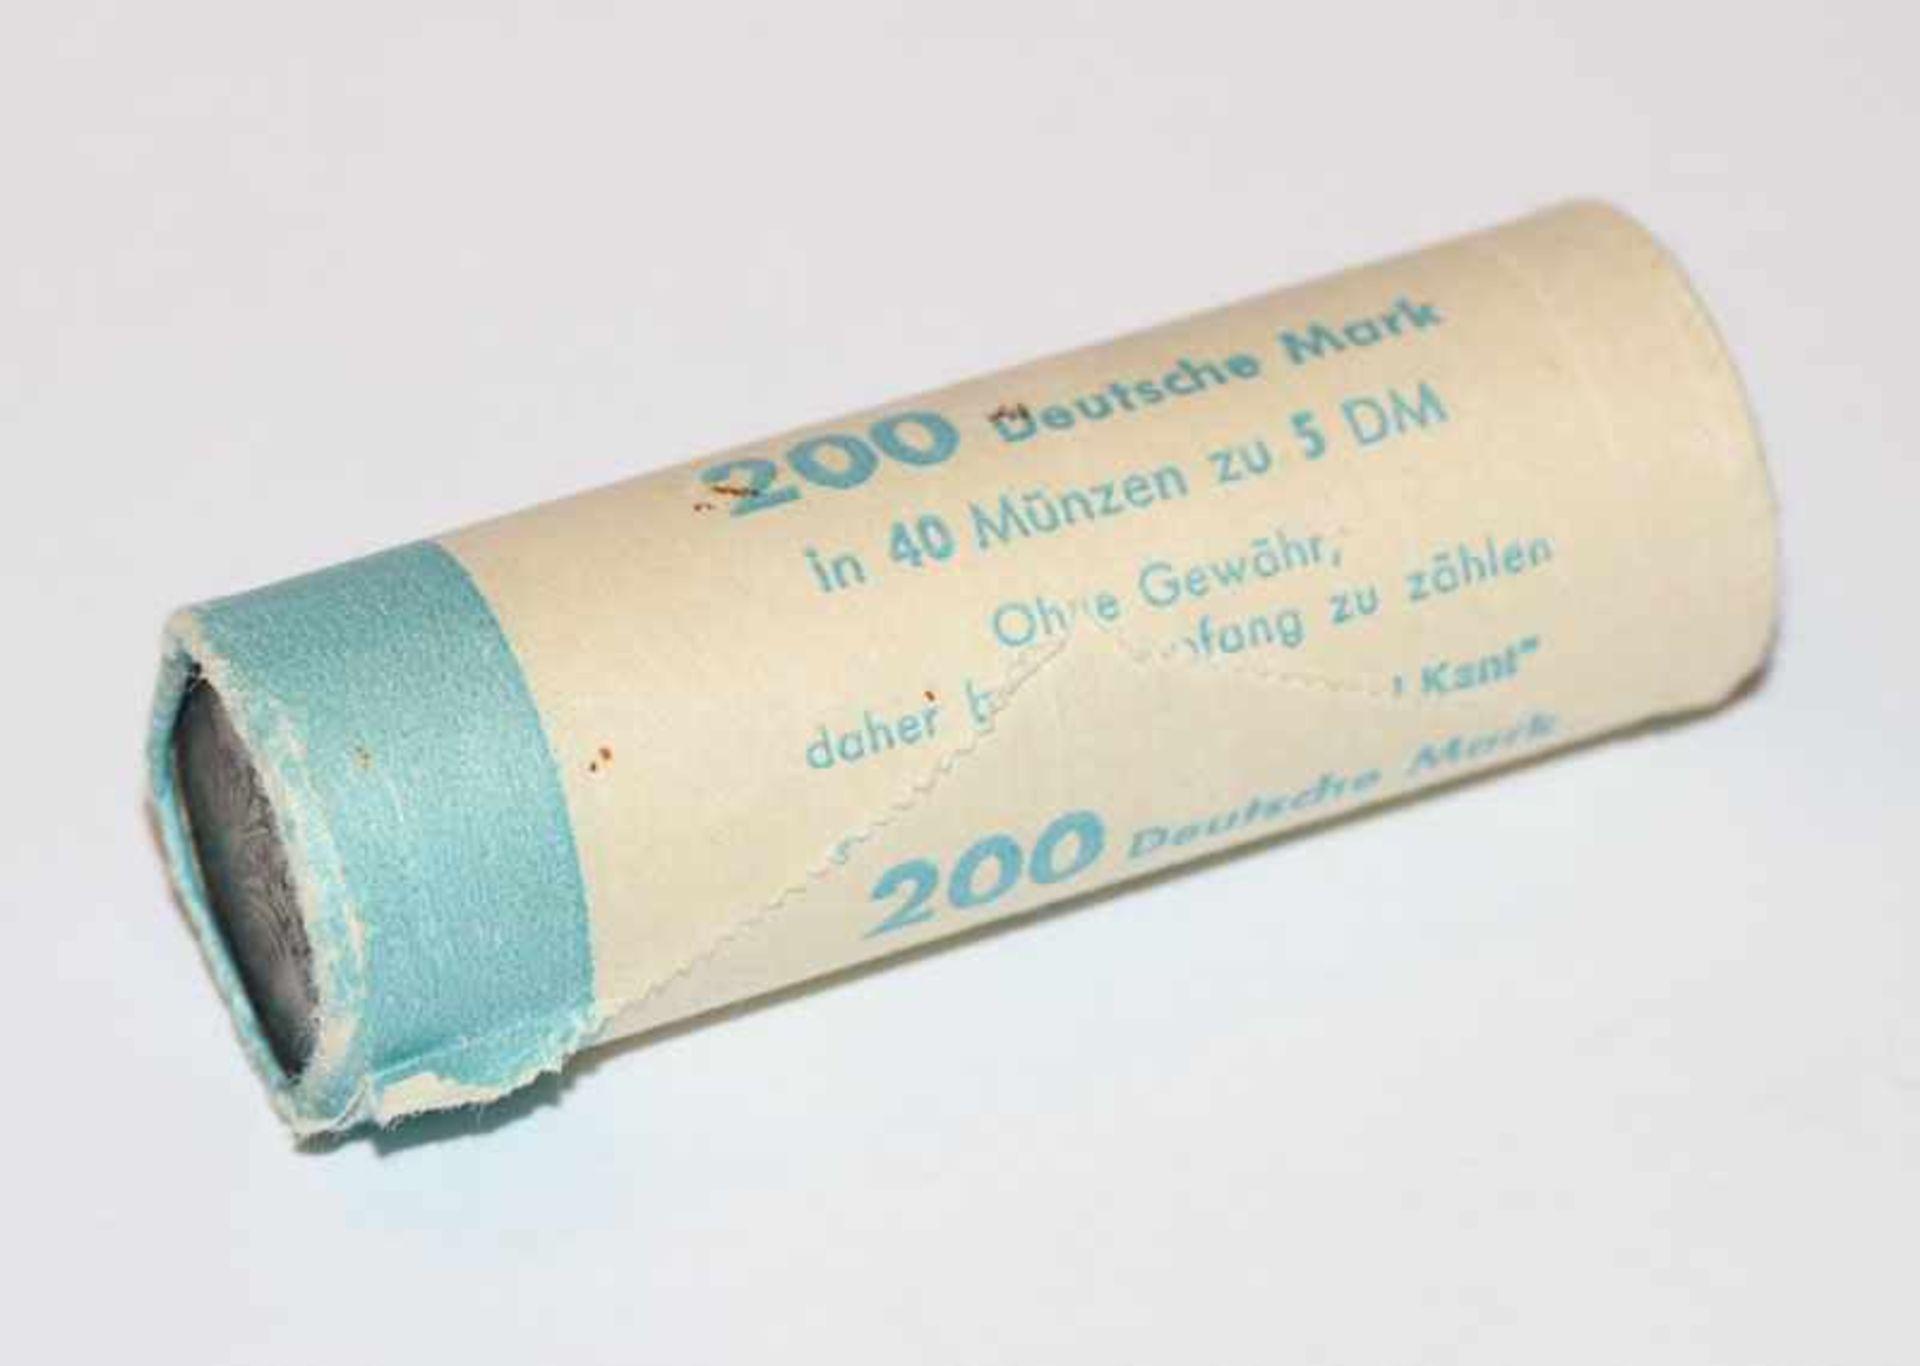 1 Bankrolle 40 x 5 DM Emanuel Kant, unzirkuliert ?, 1974